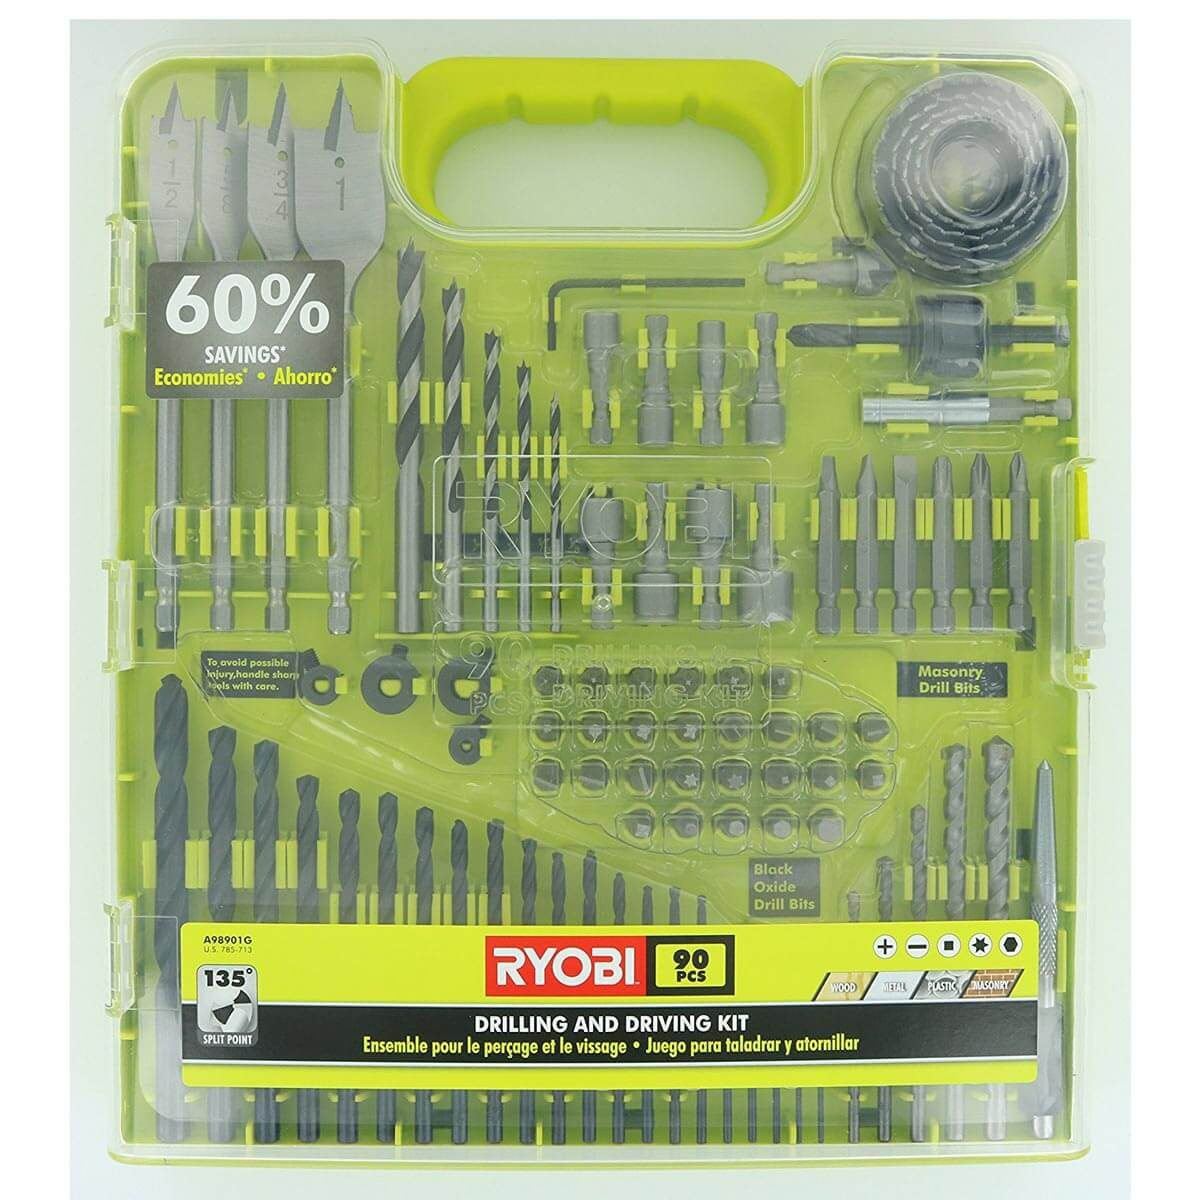 Ryobi 90-piece drill bit set